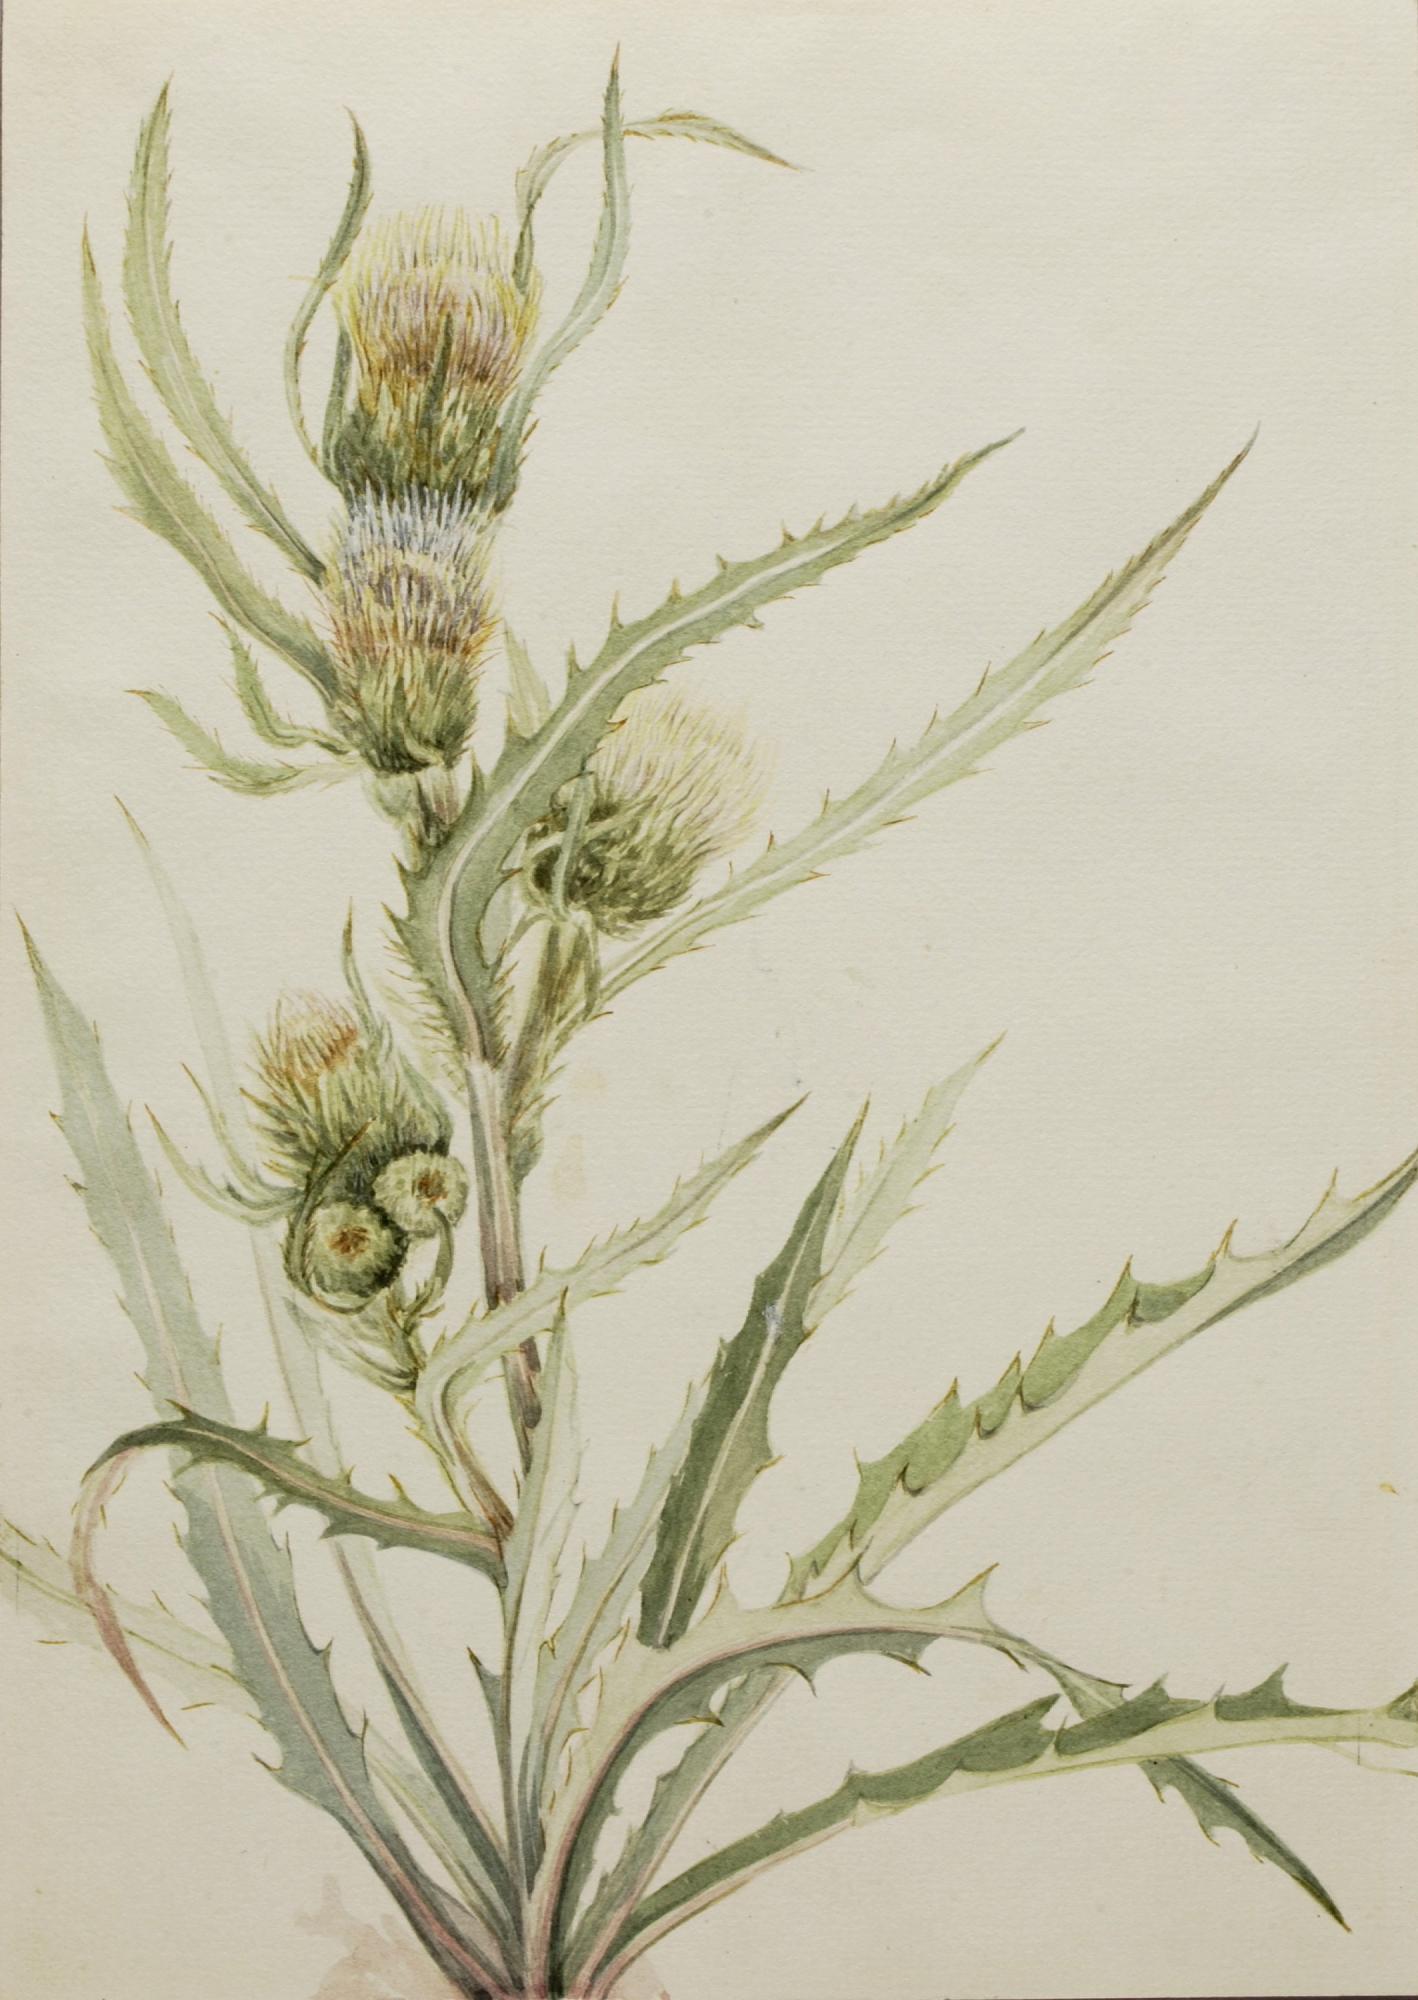 White thistle cirsium hookeranum smithsonian american art museum zoom download mightylinksfo